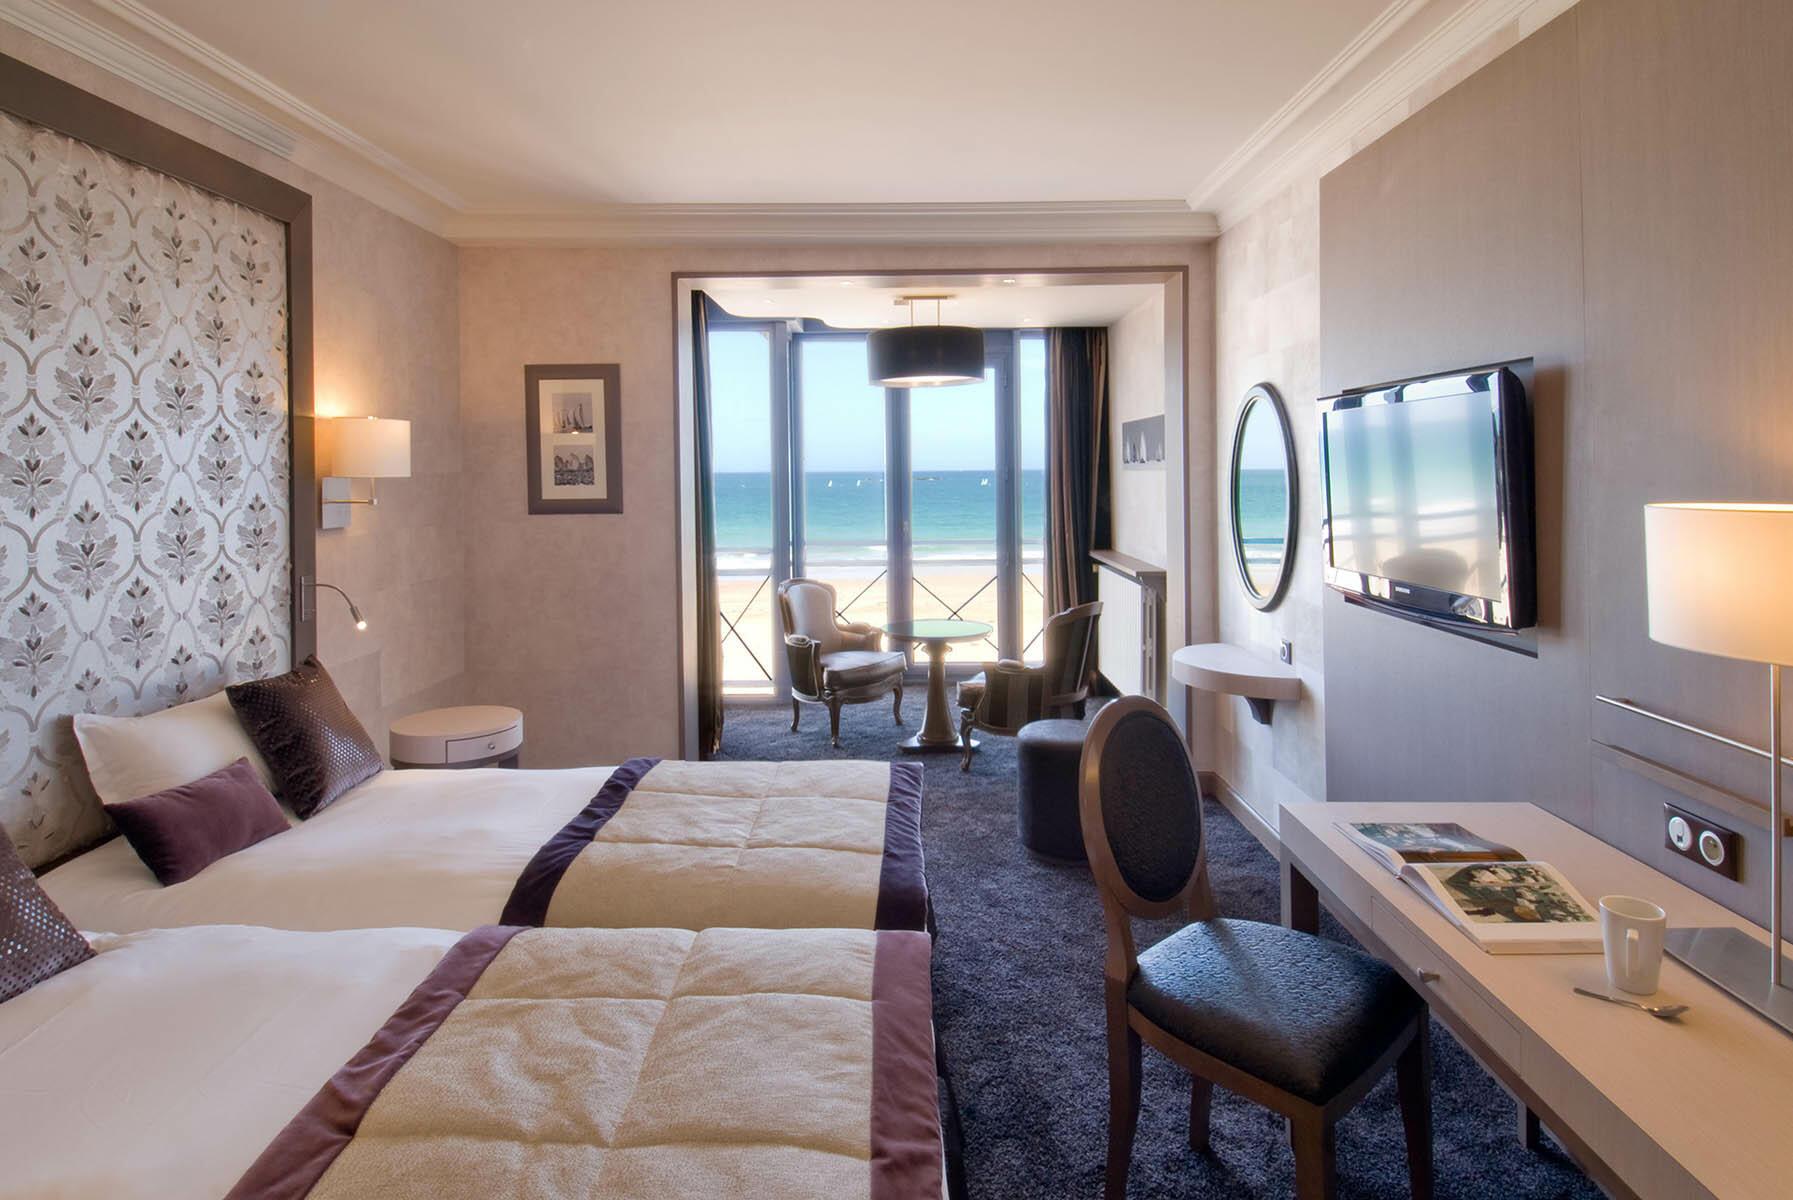 Croisiere Prestige Beach at Grand Hotel des Thermes